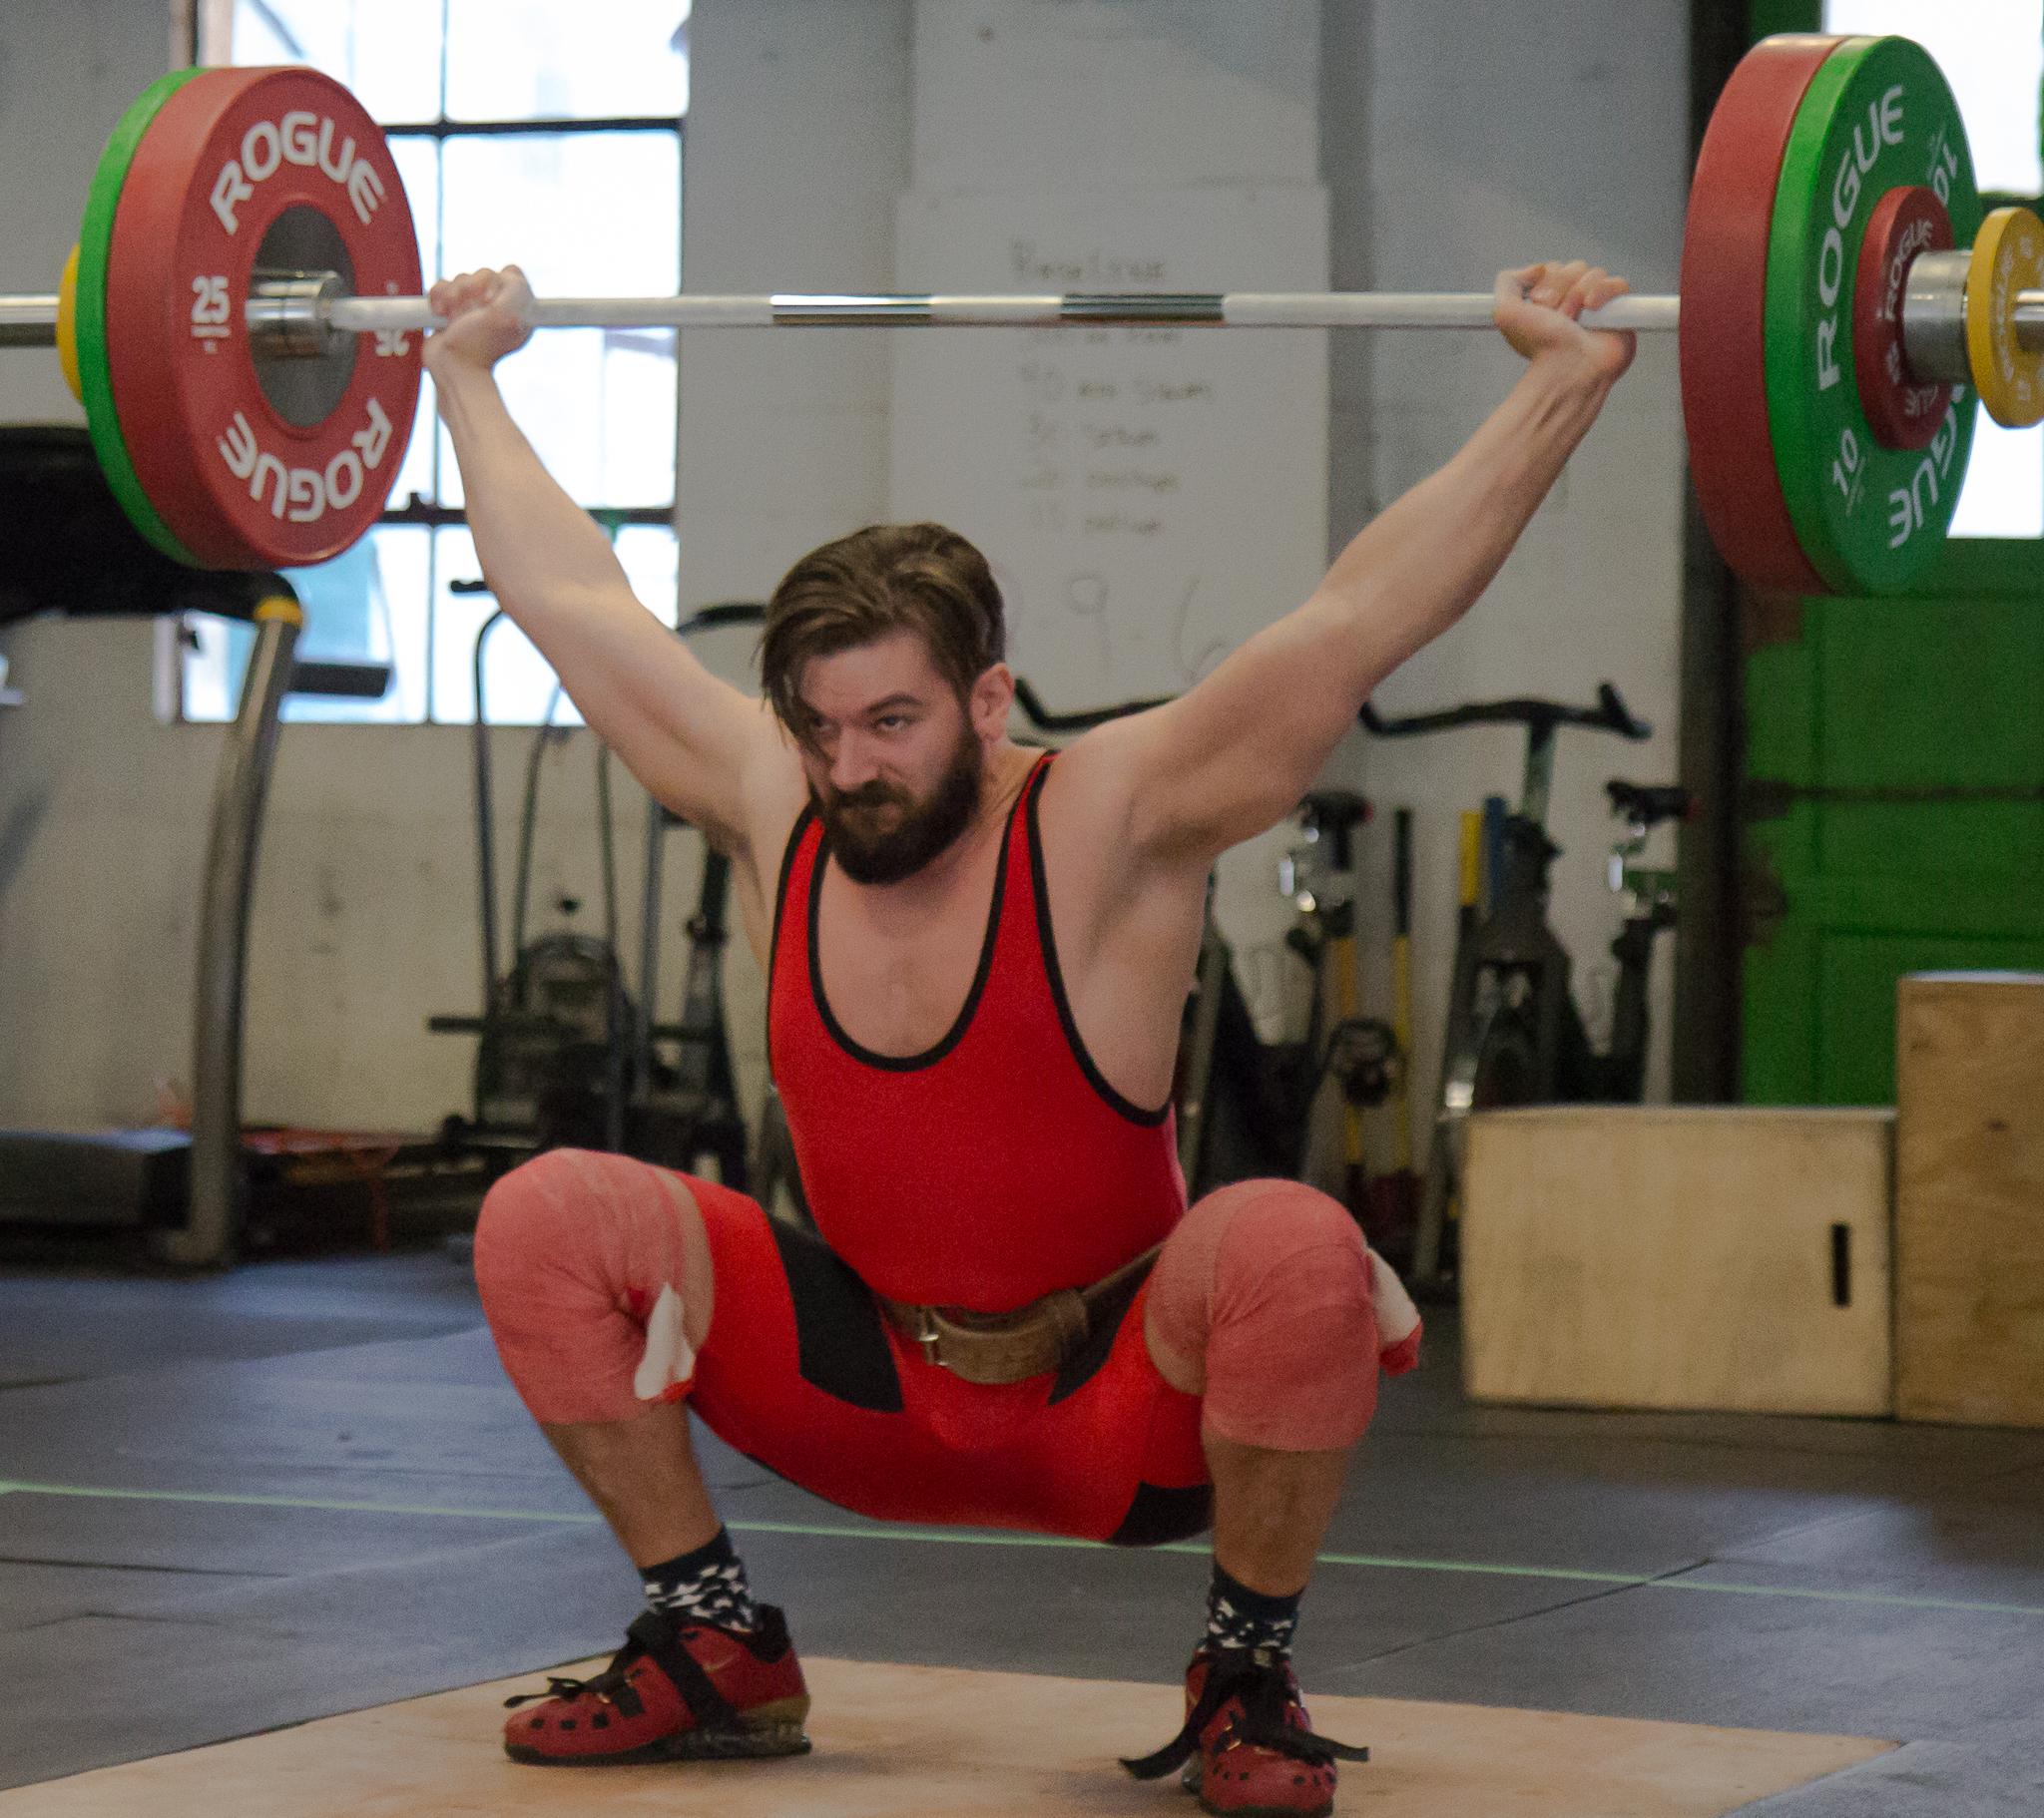 3-men-warwick-new-york-intrepid-strength-conditioning-winter-open-weightlifting-meet-weightlifting-photography (3 of 6).jpg